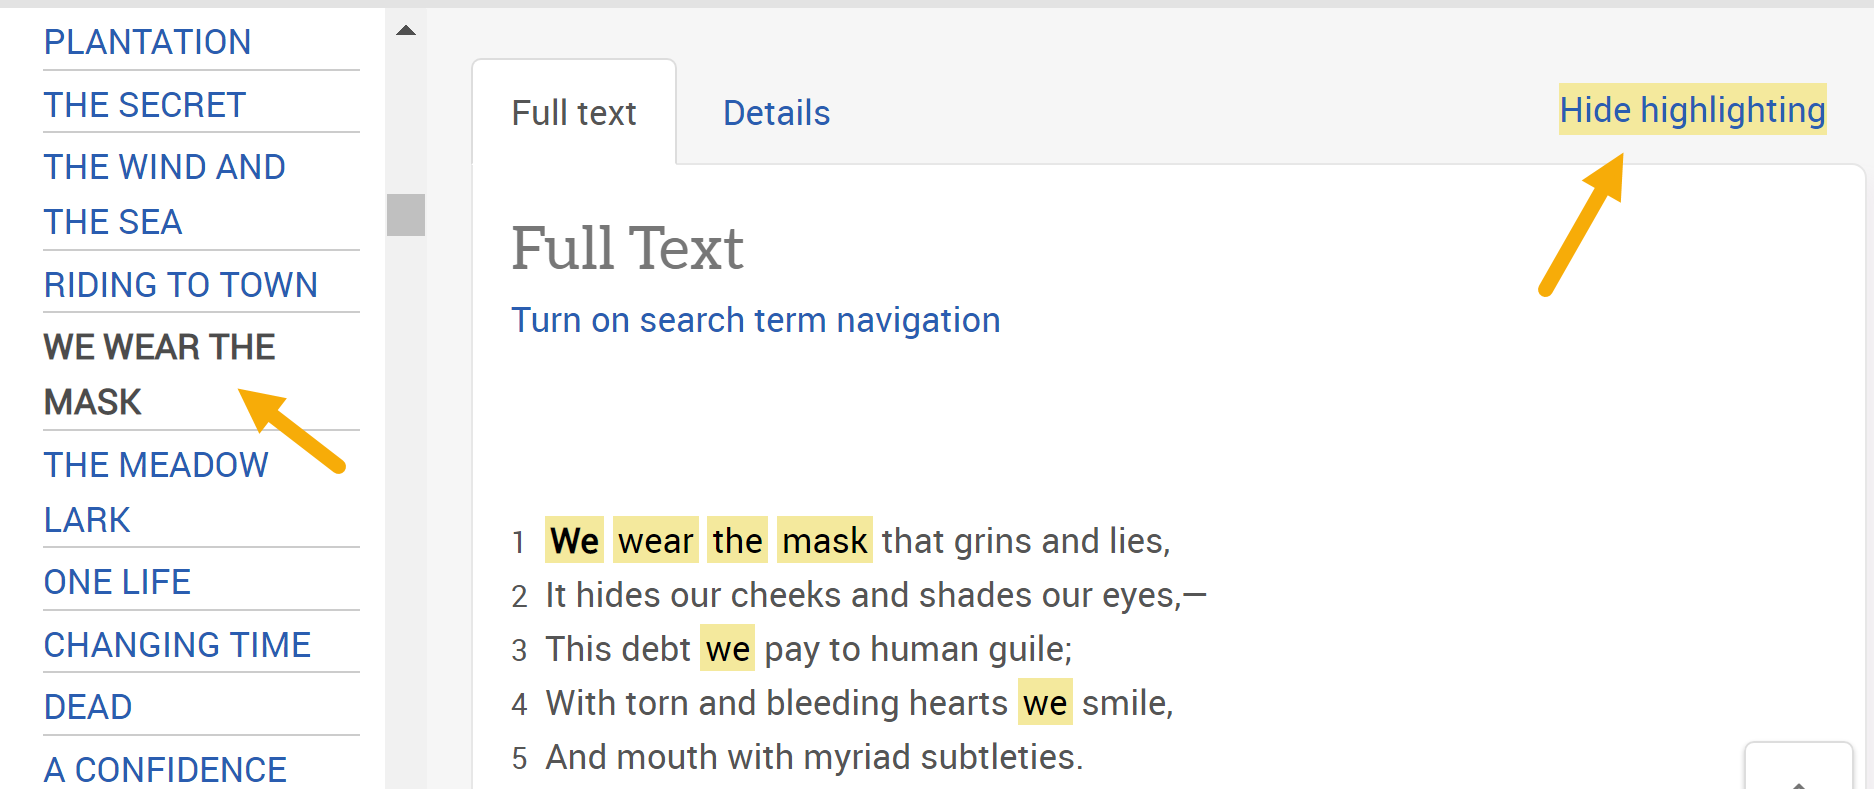 Screenshot of full-text of poem